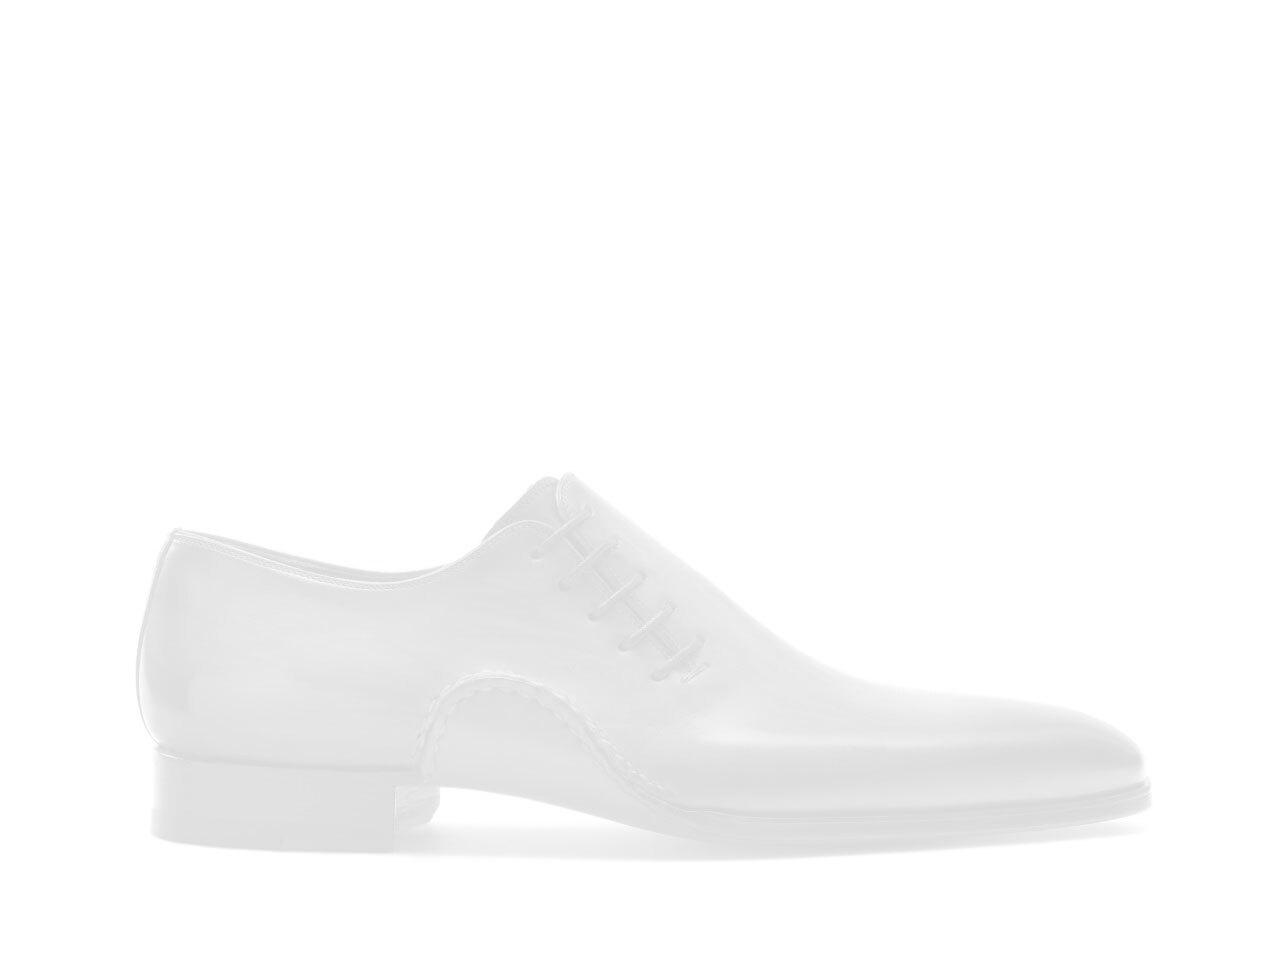 Side view of the Magnanni Keane Cognac Men's Oxford Shoes